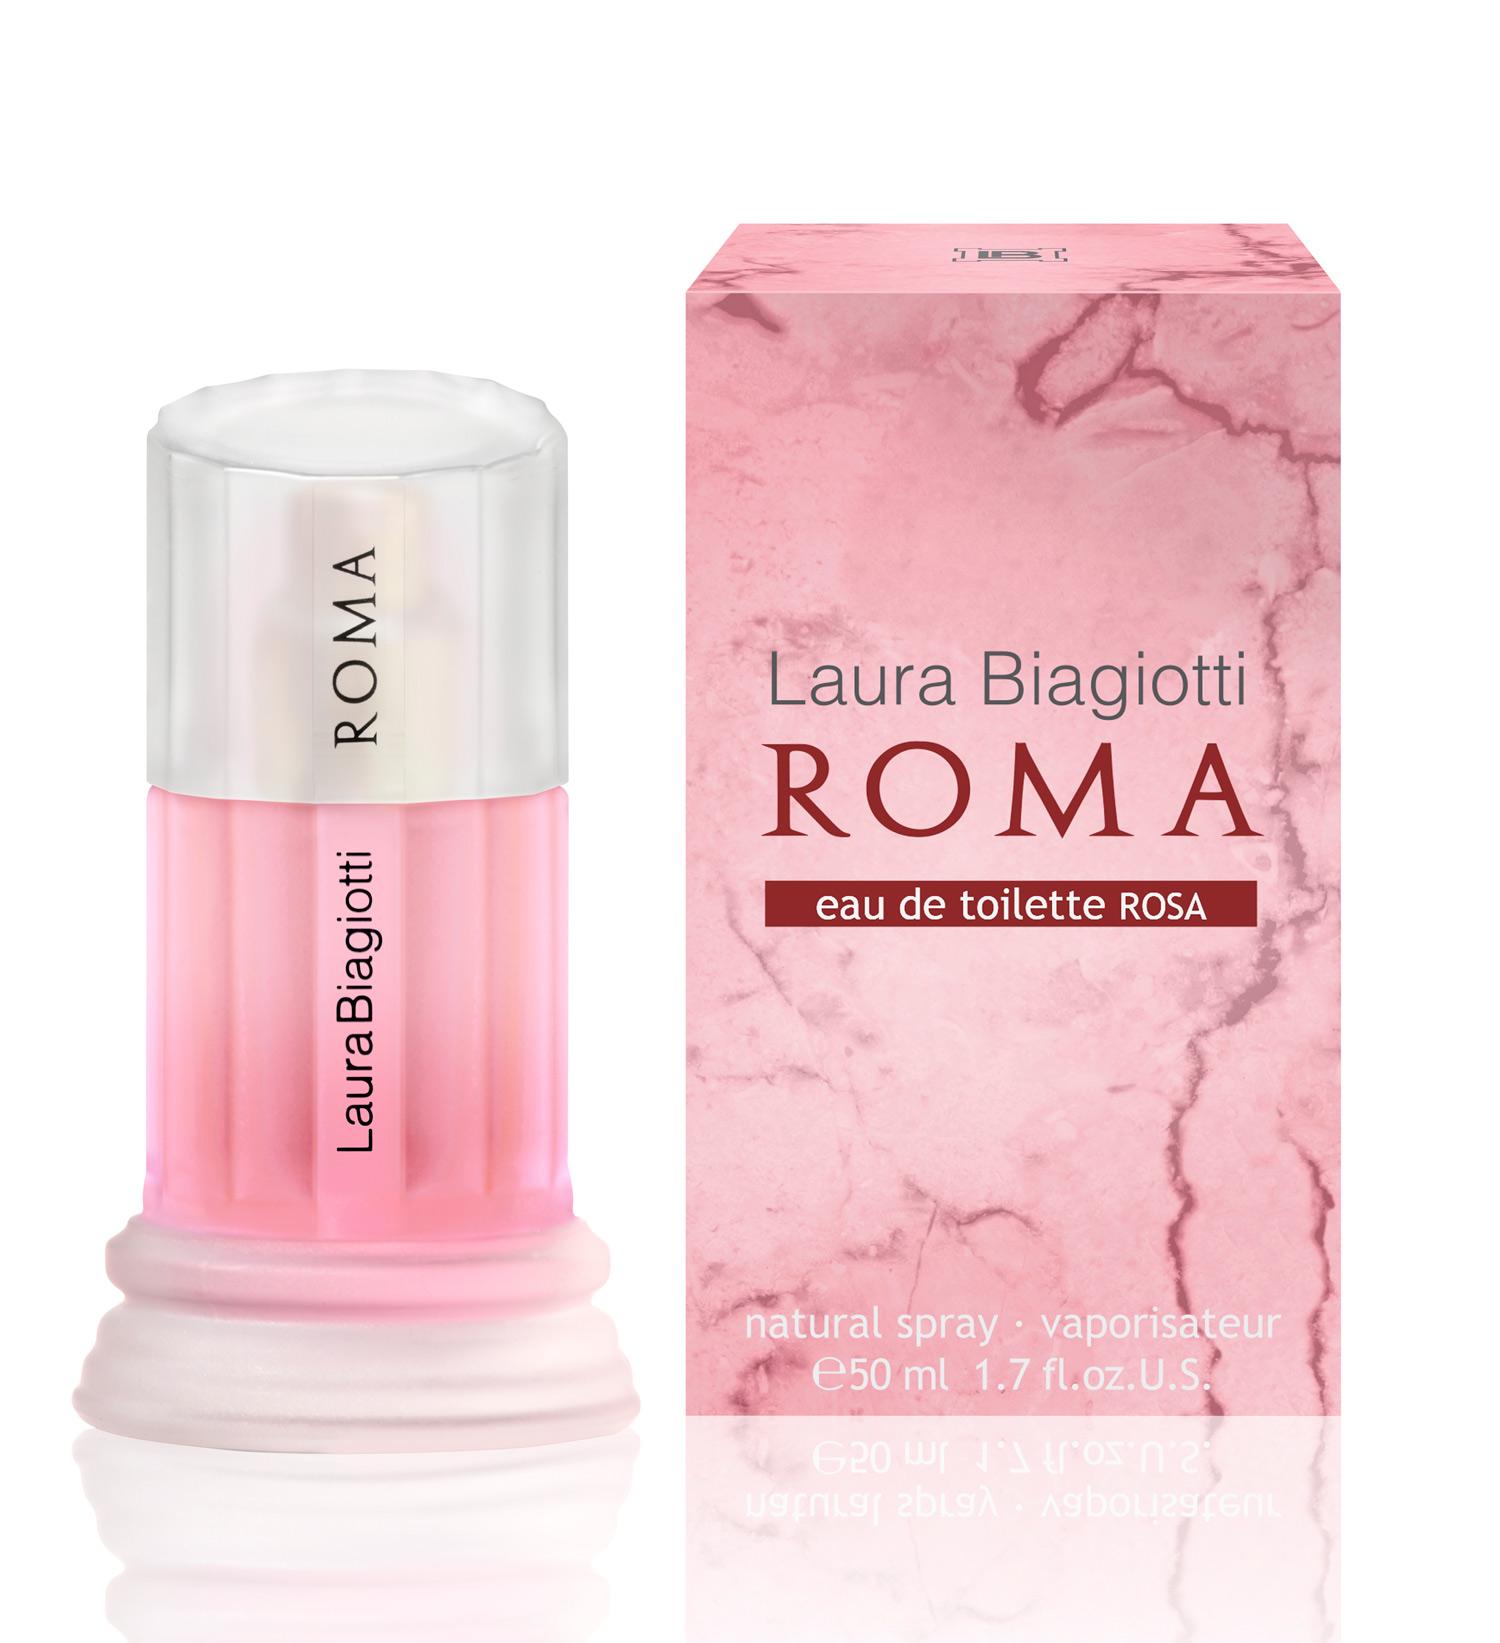 roma eau de toilette rosa laura biagiotti perfume a new. Black Bedroom Furniture Sets. Home Design Ideas